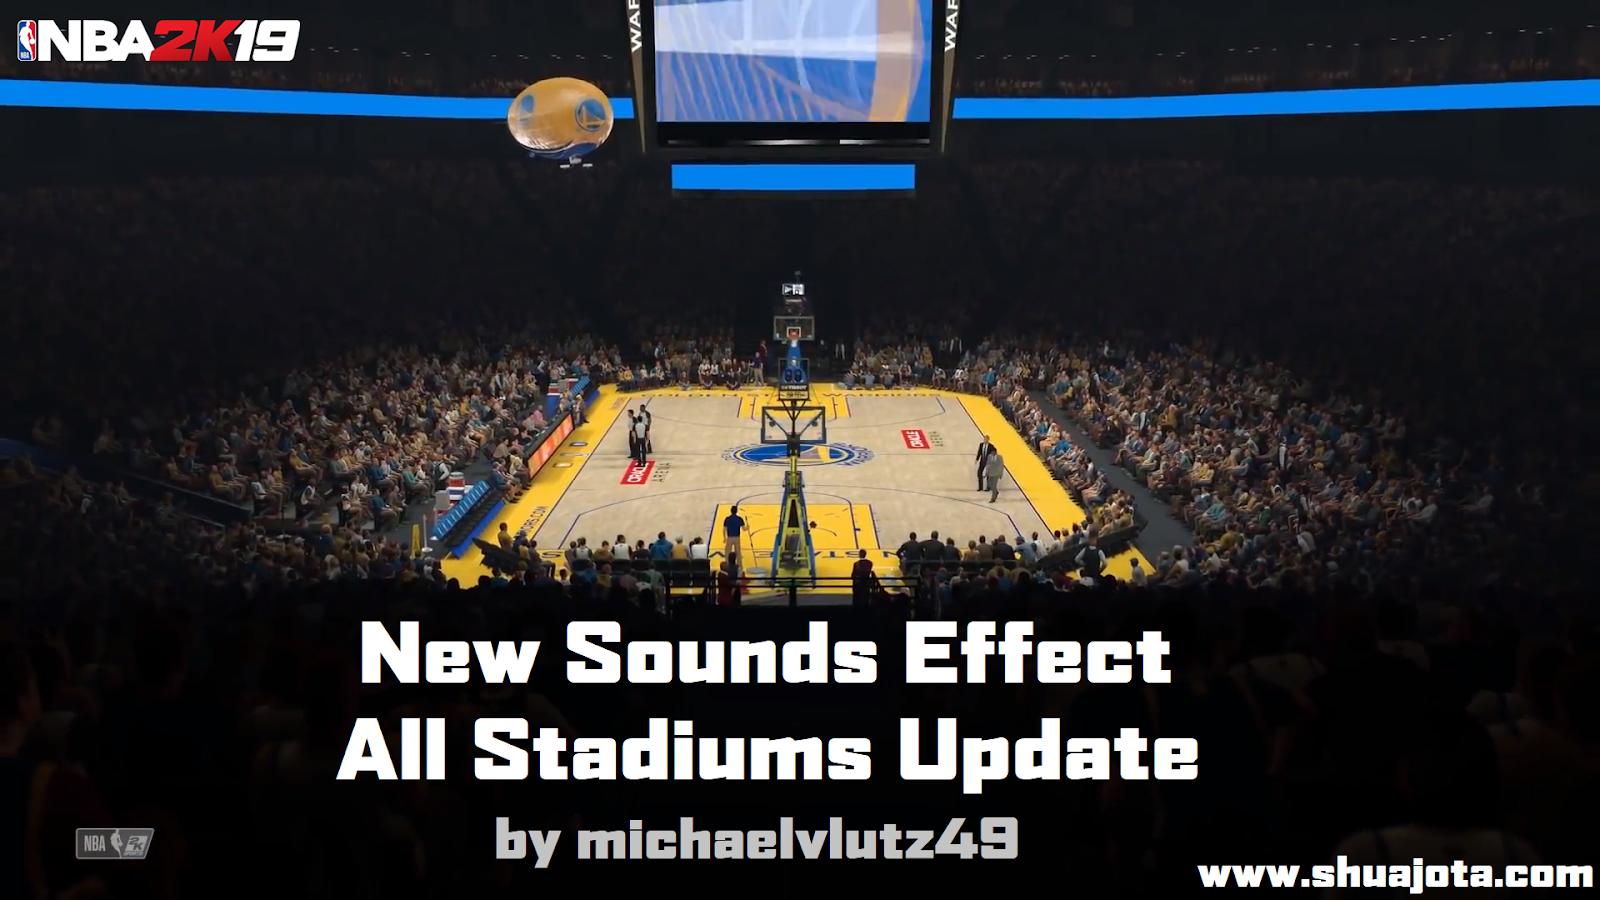 ff42510b524 NBA 2K19 - New Sounds Effect All Stadiums Update by michaelvlutz49 ...